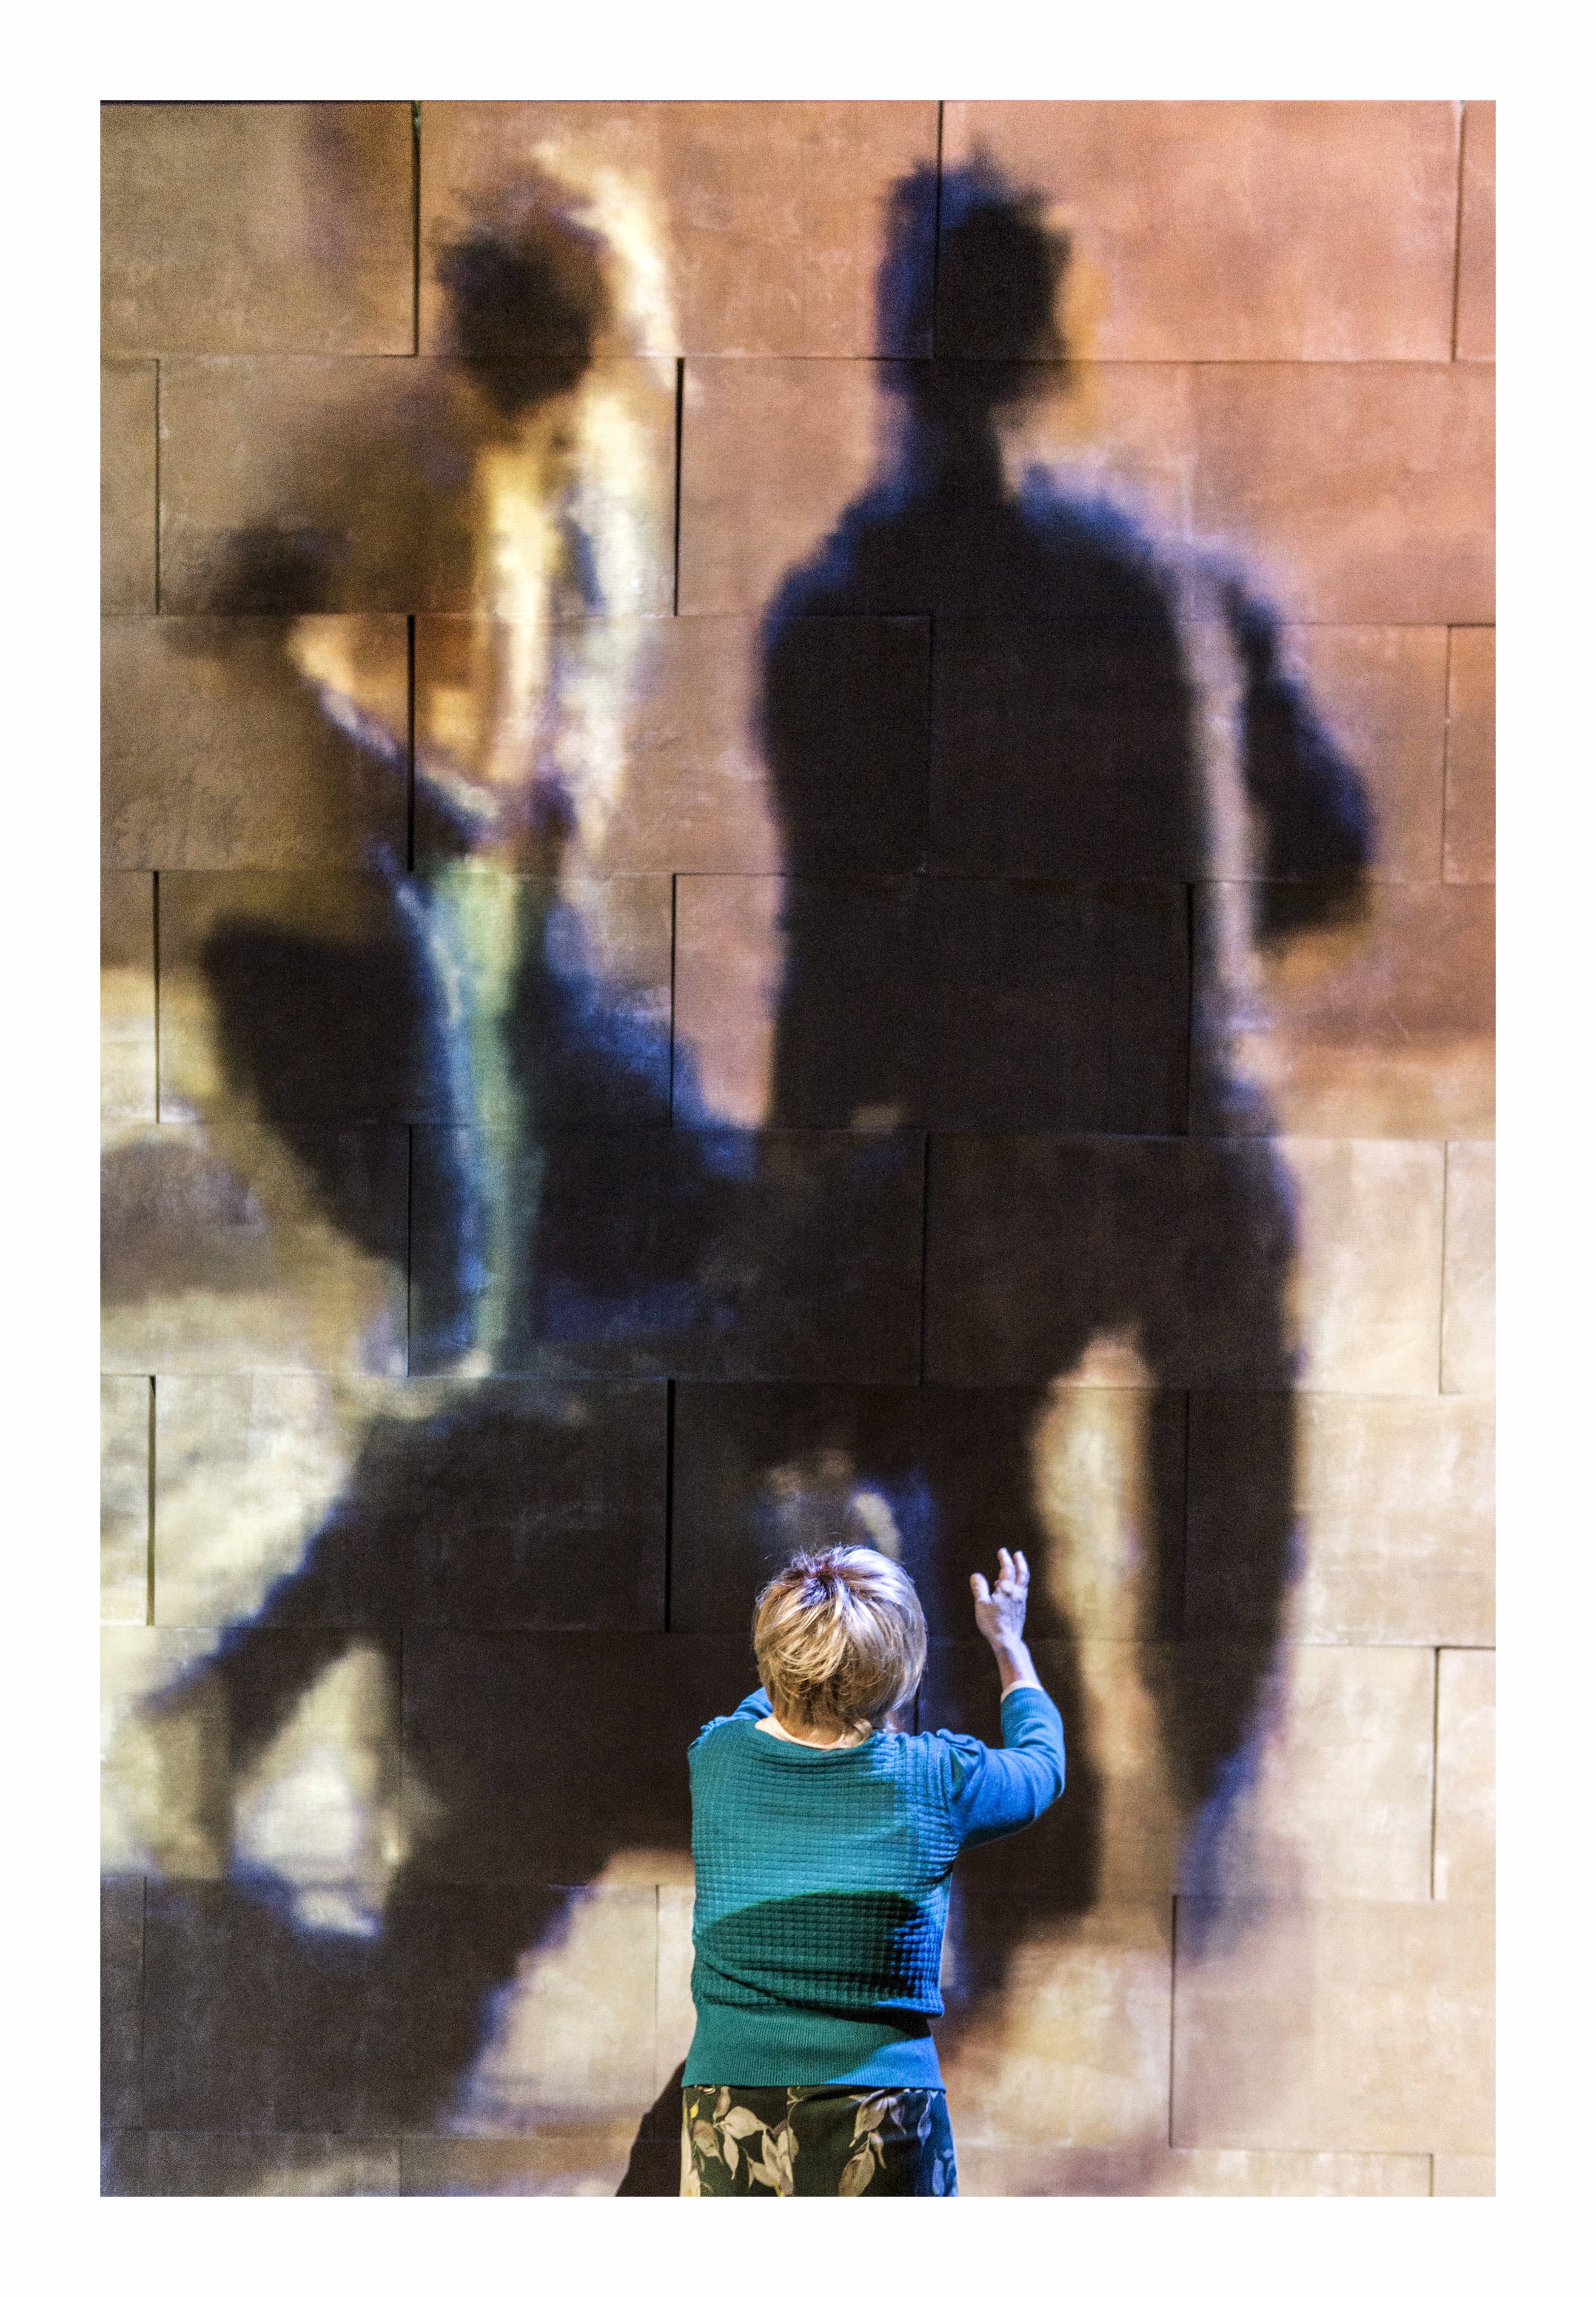 Malpertuis - Onze Koen - persfoto